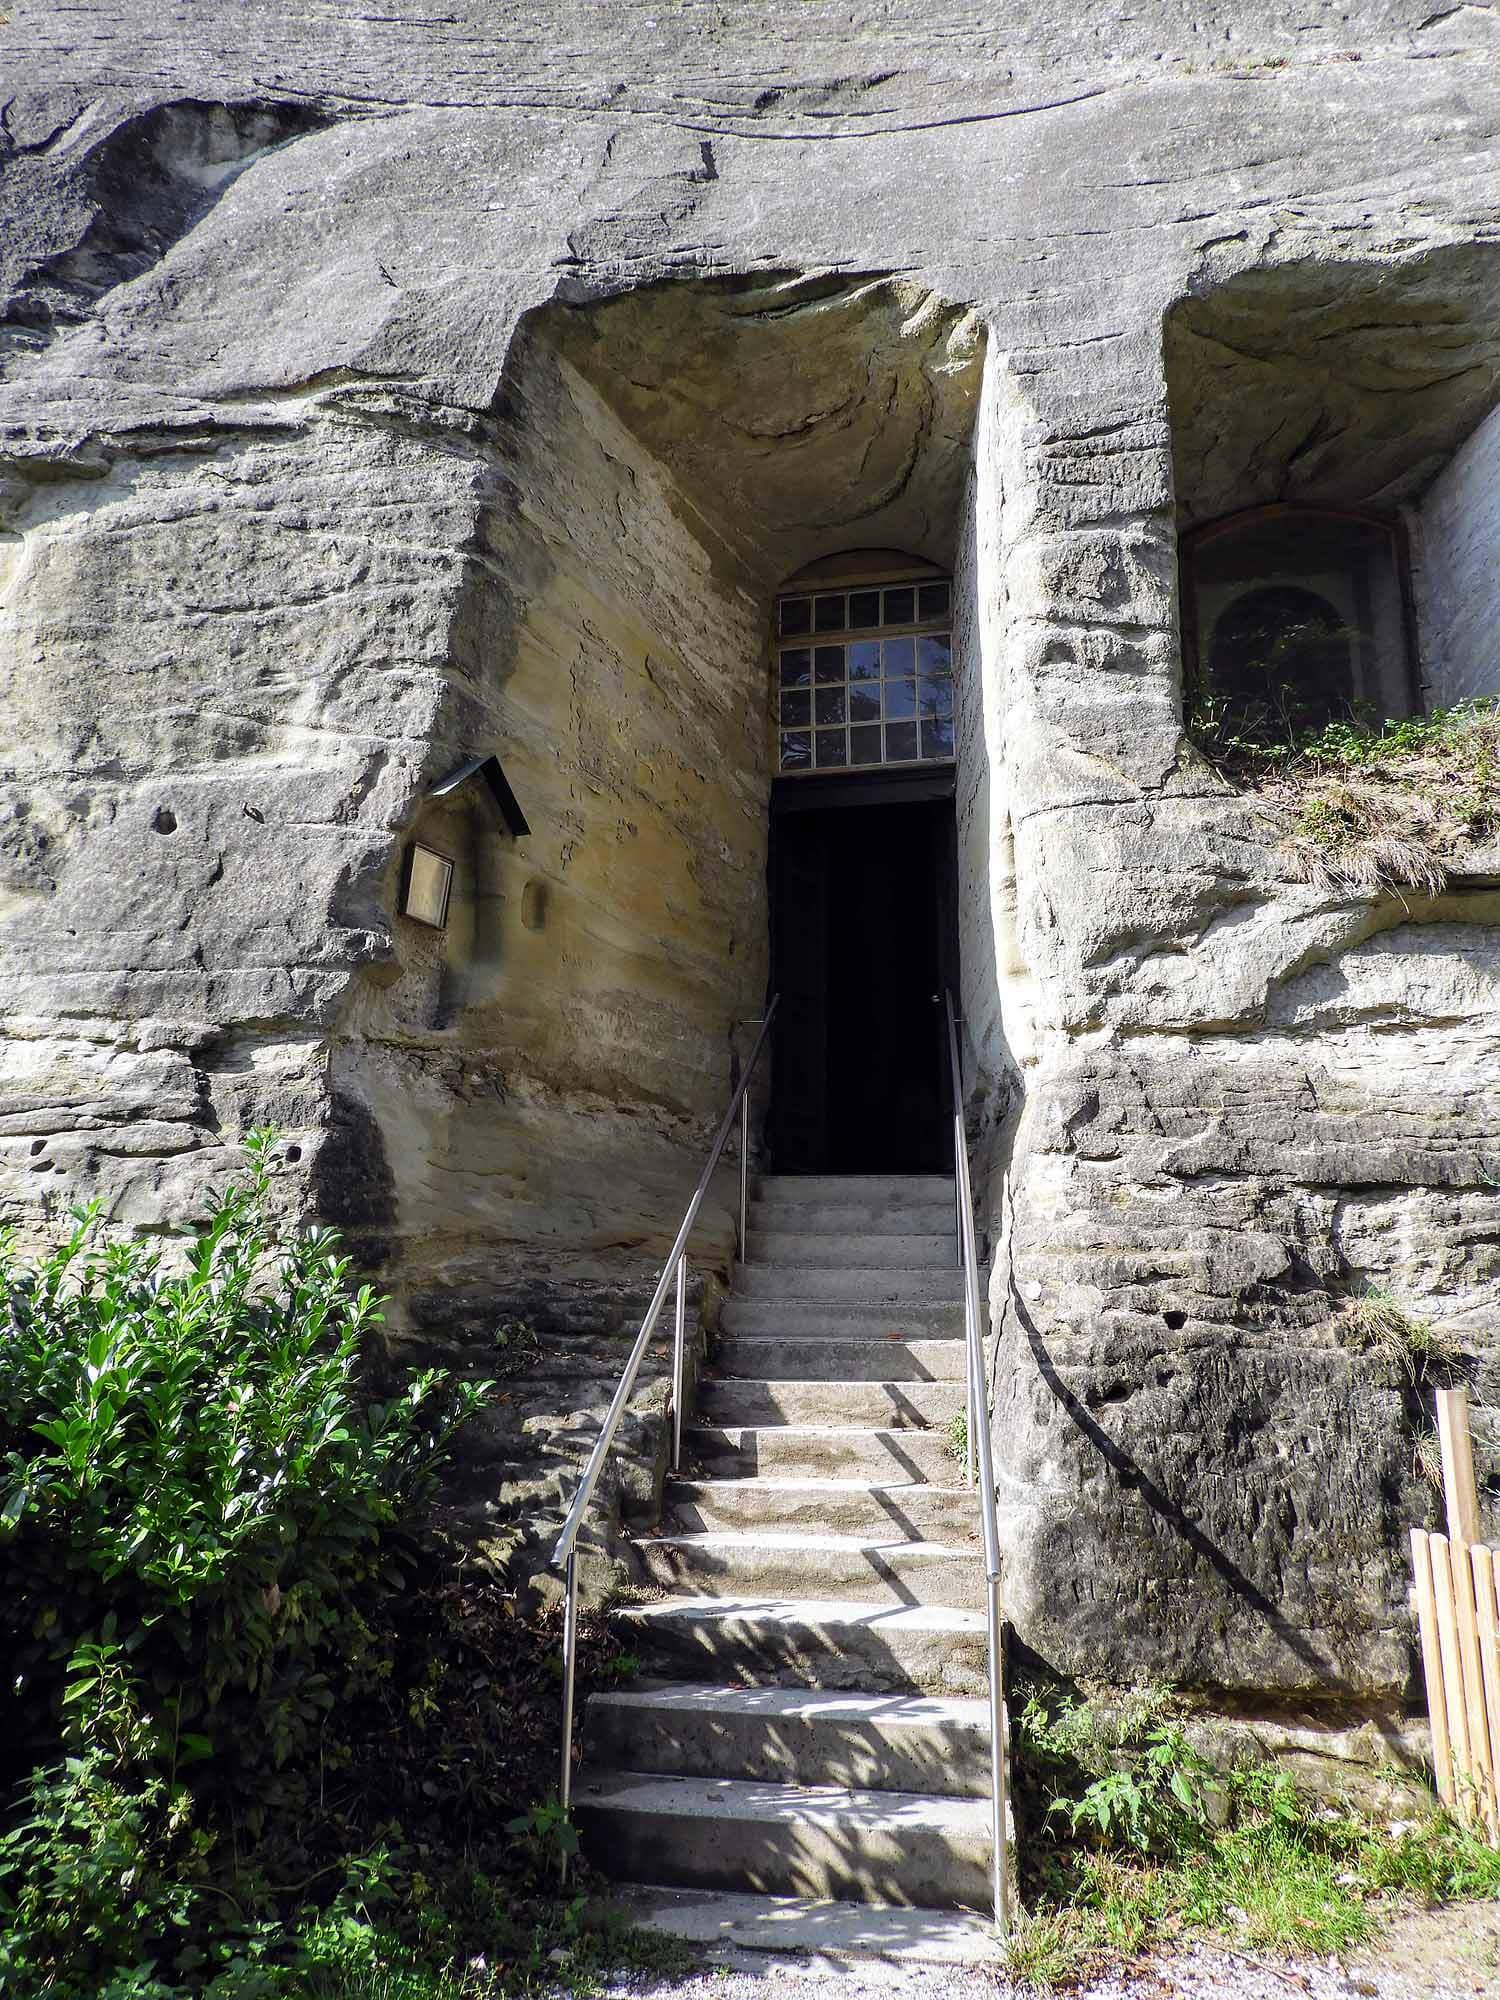 switzerland-fribourg-magdalena-einsiedelei-rock-church-pilgramage-stone-steps-cave.jpg